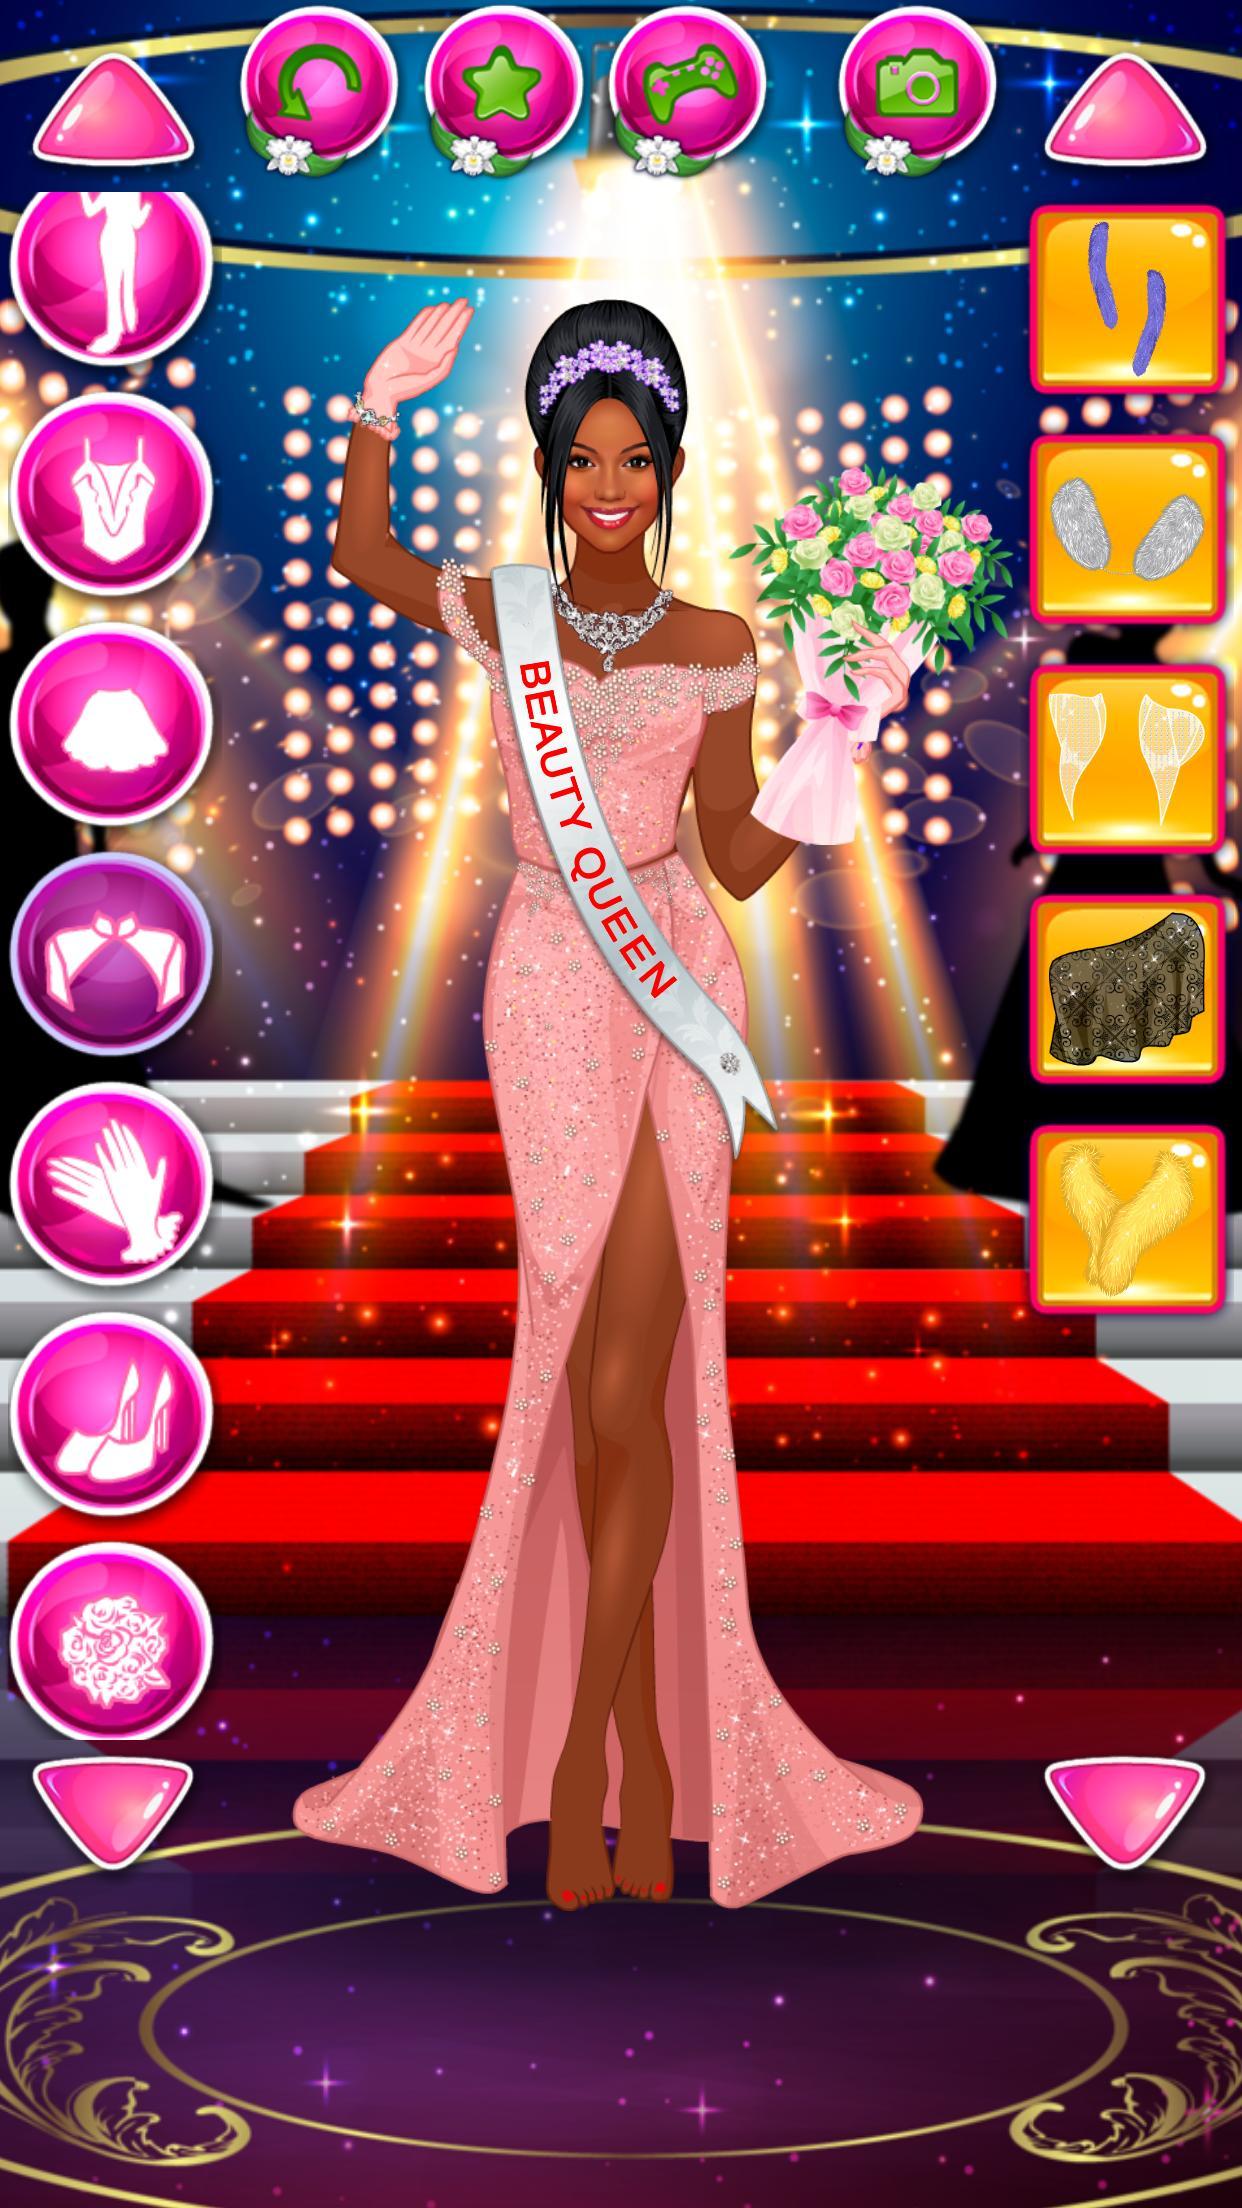 Beauty Queen Dress Up - Star Girl Fashion 1.1 Screenshot 11